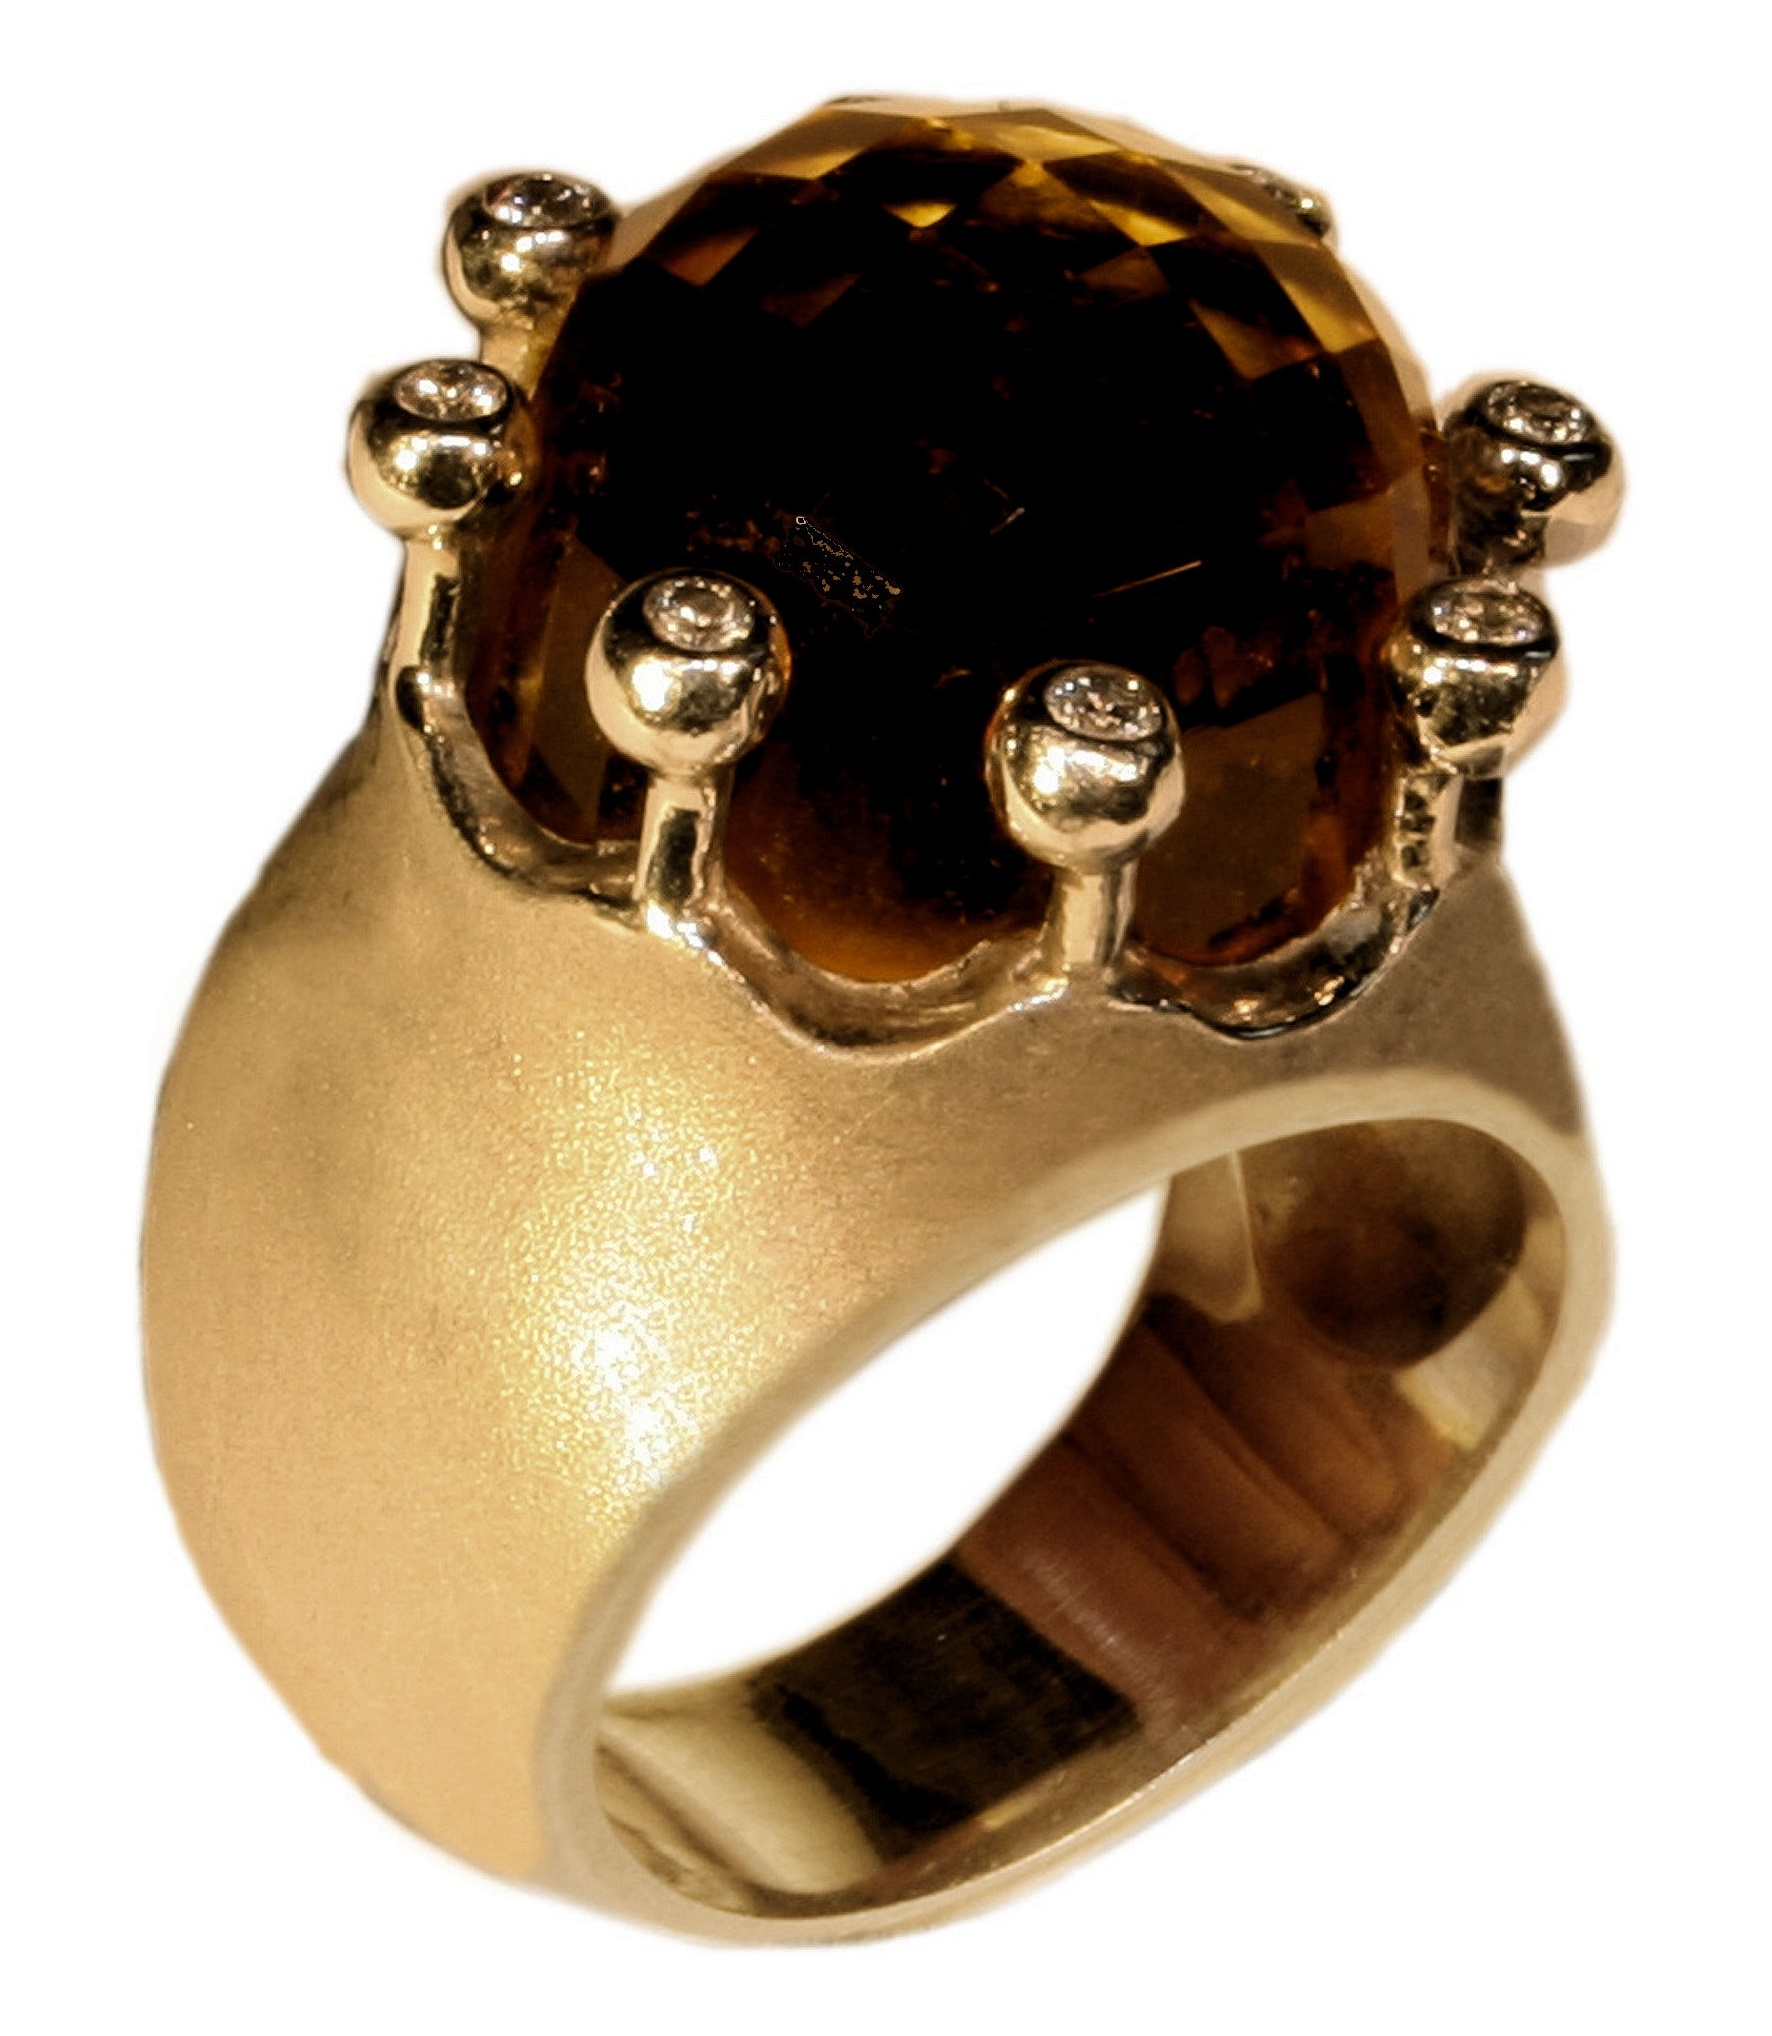 Imperial Crown Ring; Jane Gordon Jewelry